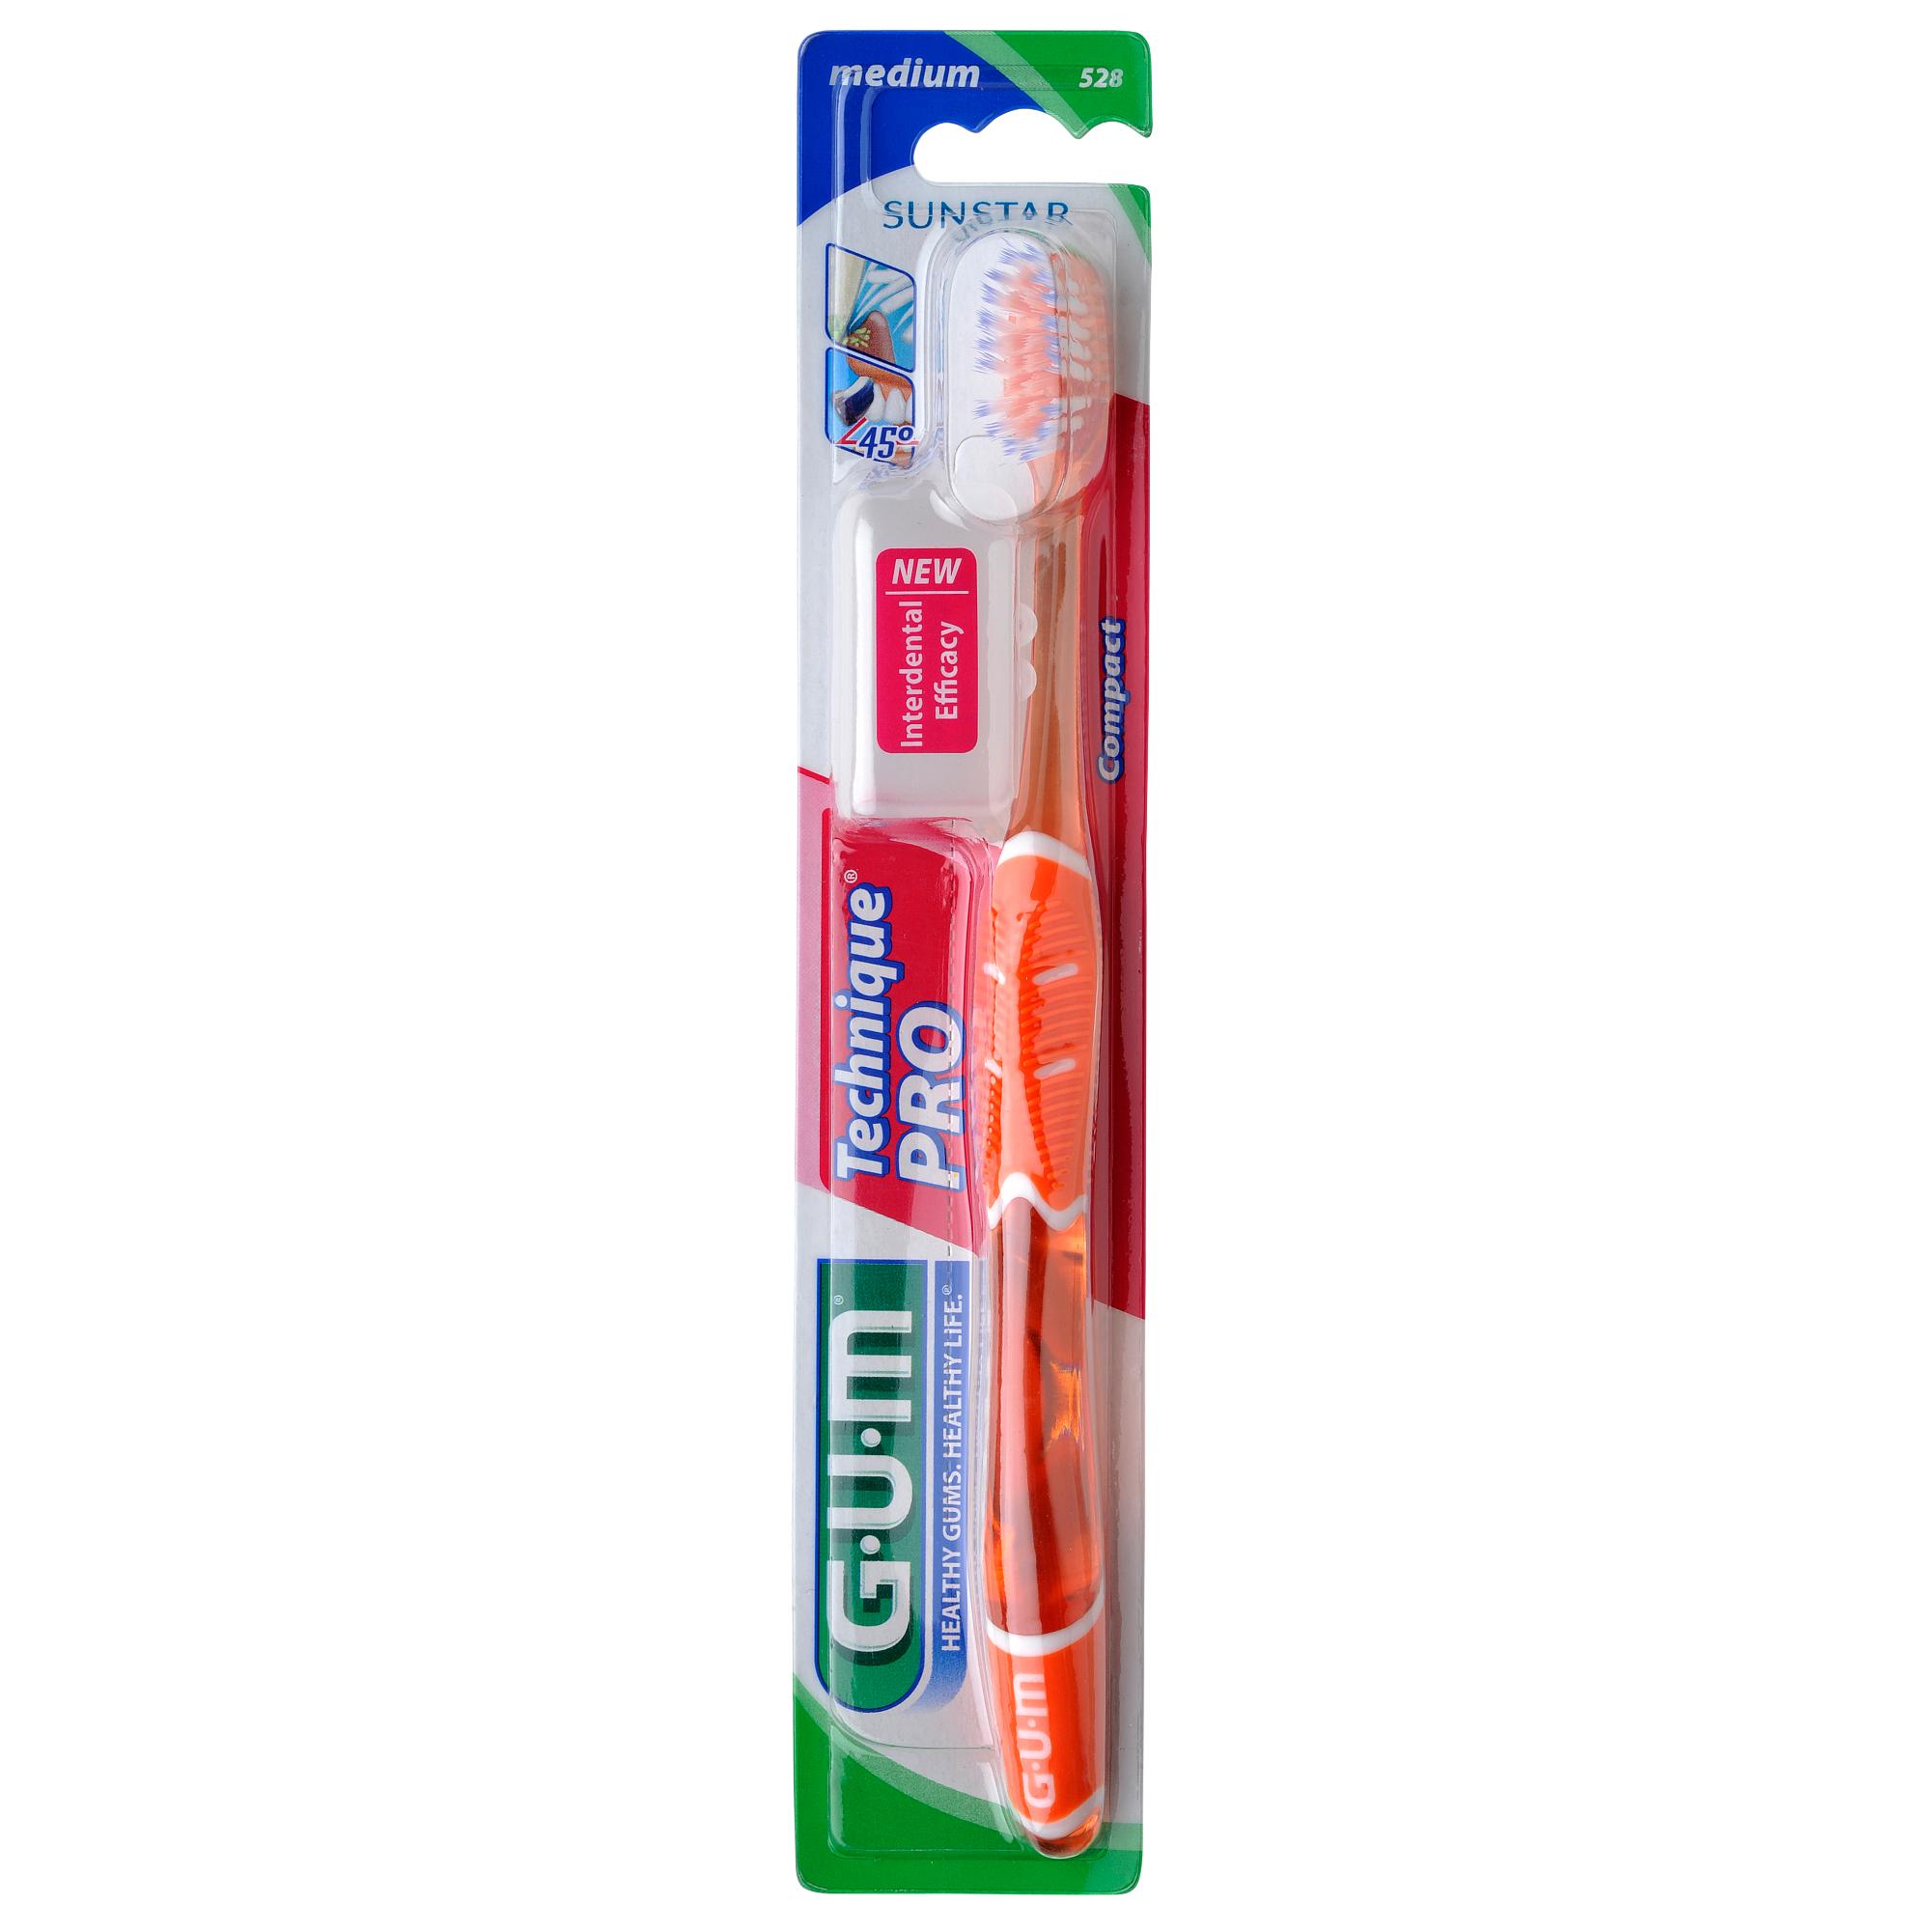 Gum Technique PRO Compact Medium Οδοντόβουρτσα με Θήκη Προστασίας (528) – πορτοκαλί